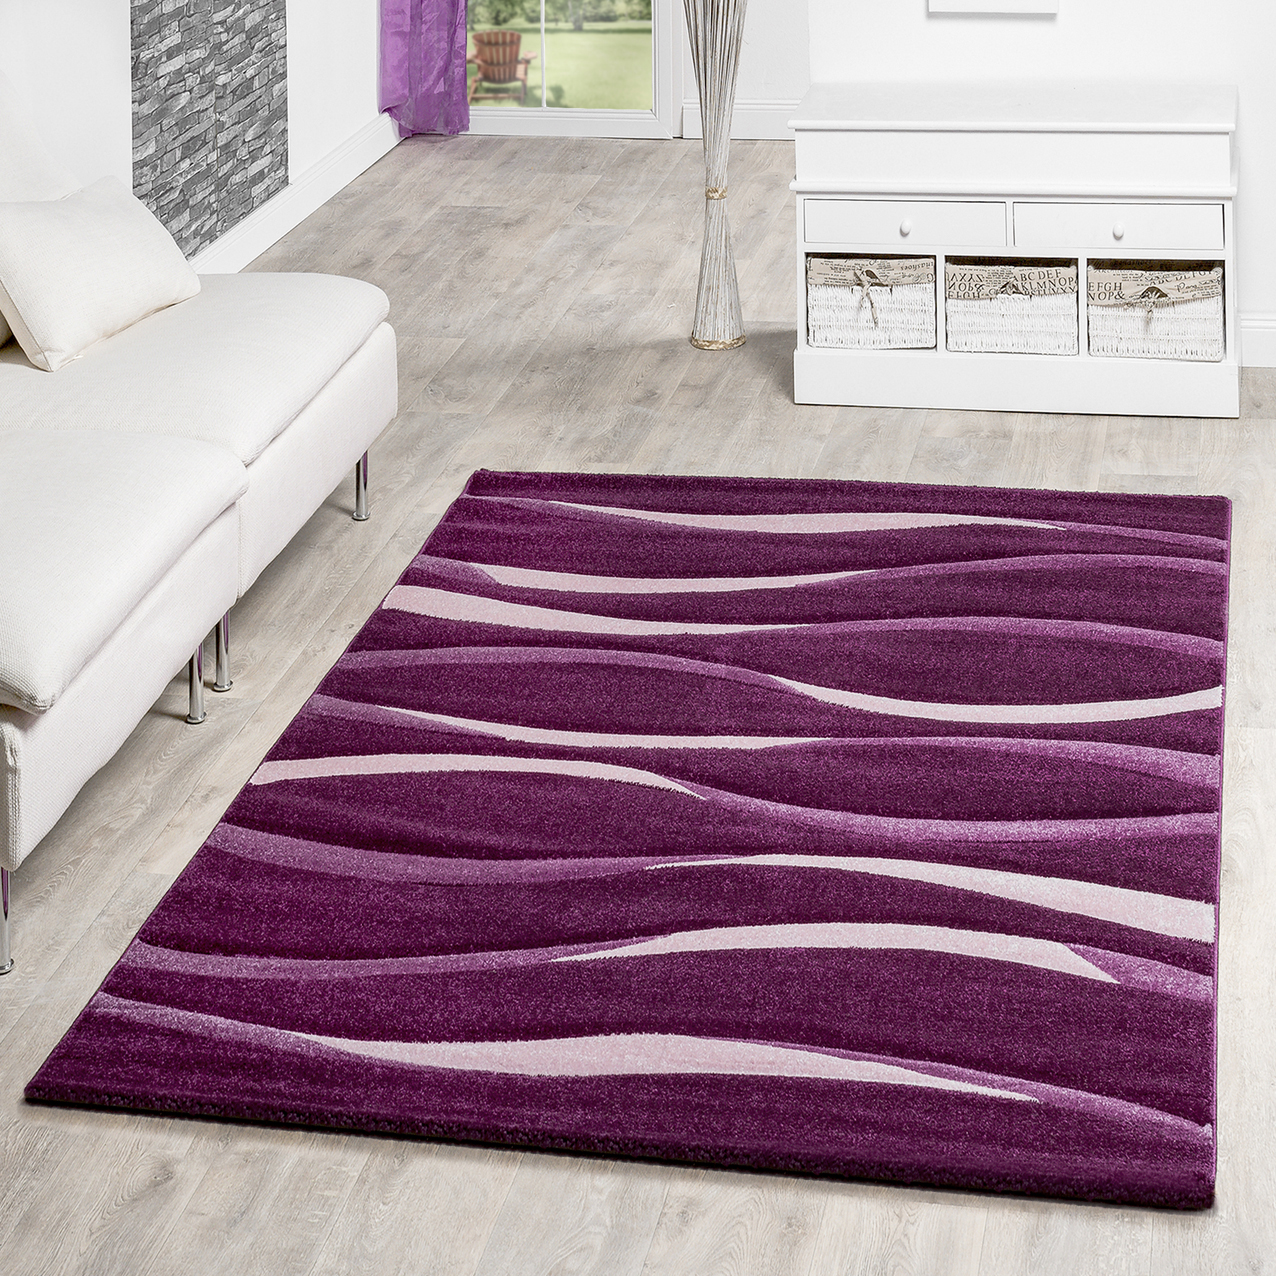 designer teppich toledo modern meliert streifen lila t ne. Black Bedroom Furniture Sets. Home Design Ideas